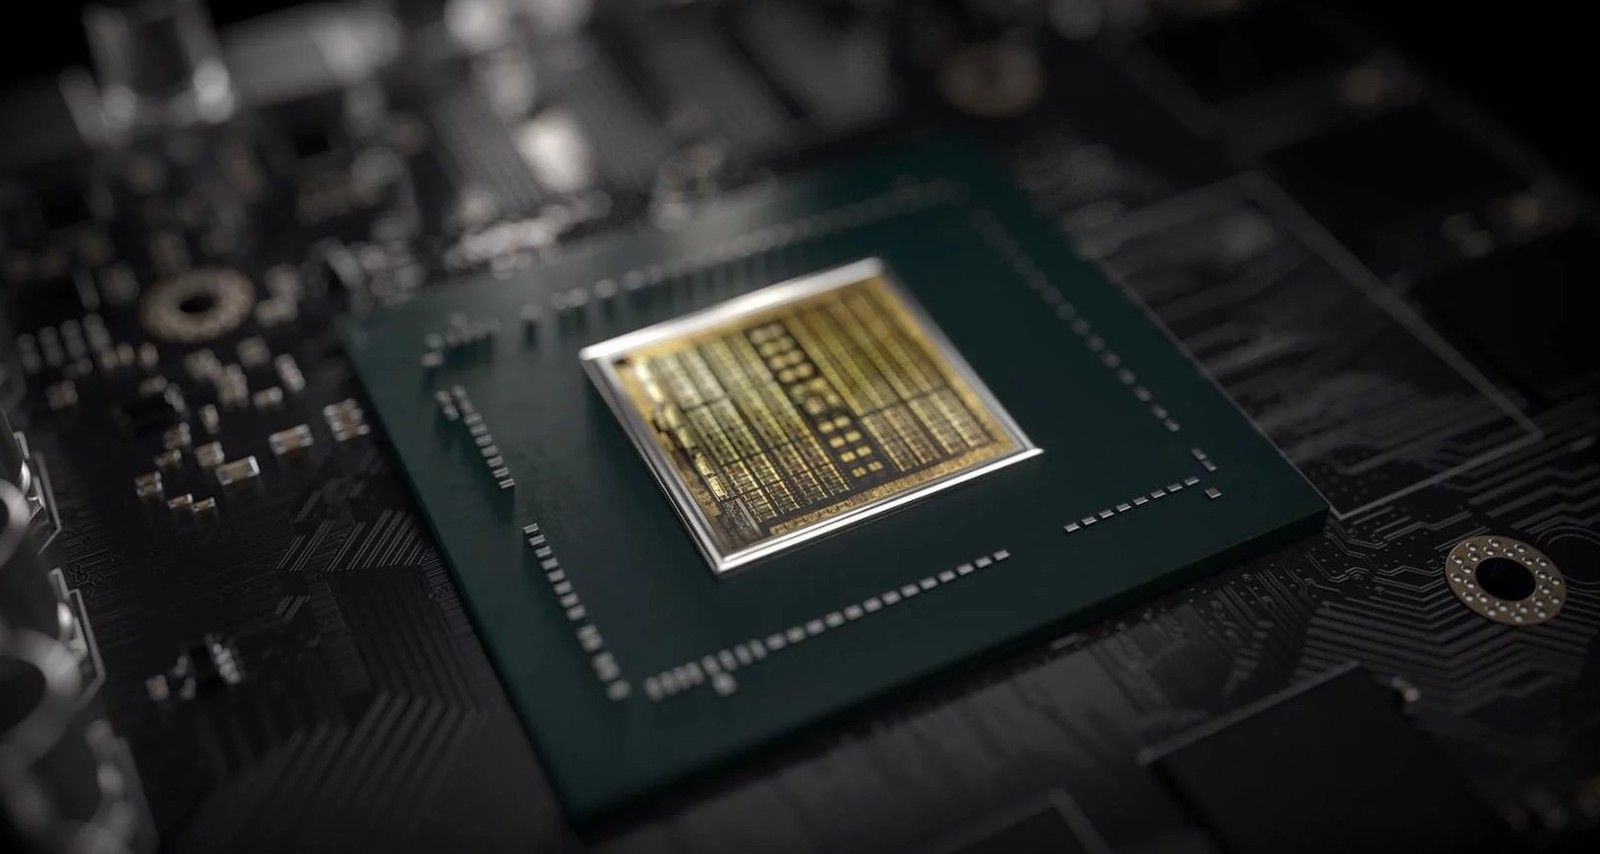 ТОП процессоров для ПК